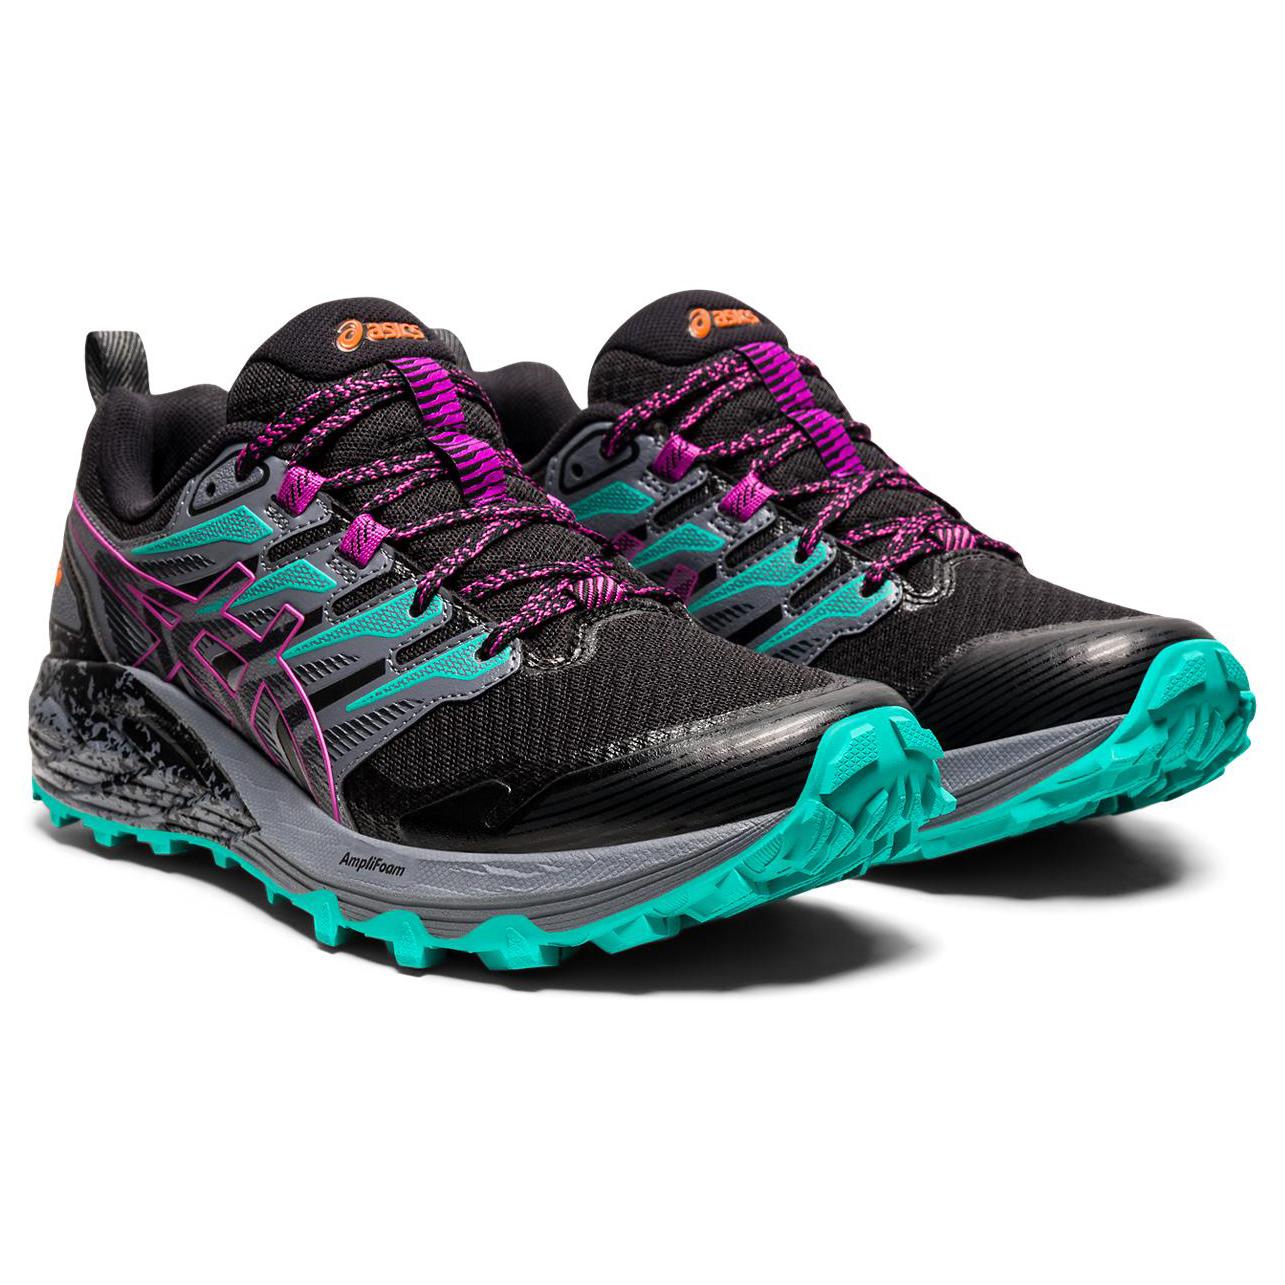 Asics - Women's Gel-Trabuco Terra - Trail running shoes - Black / Digital Grape   5,5 (US)